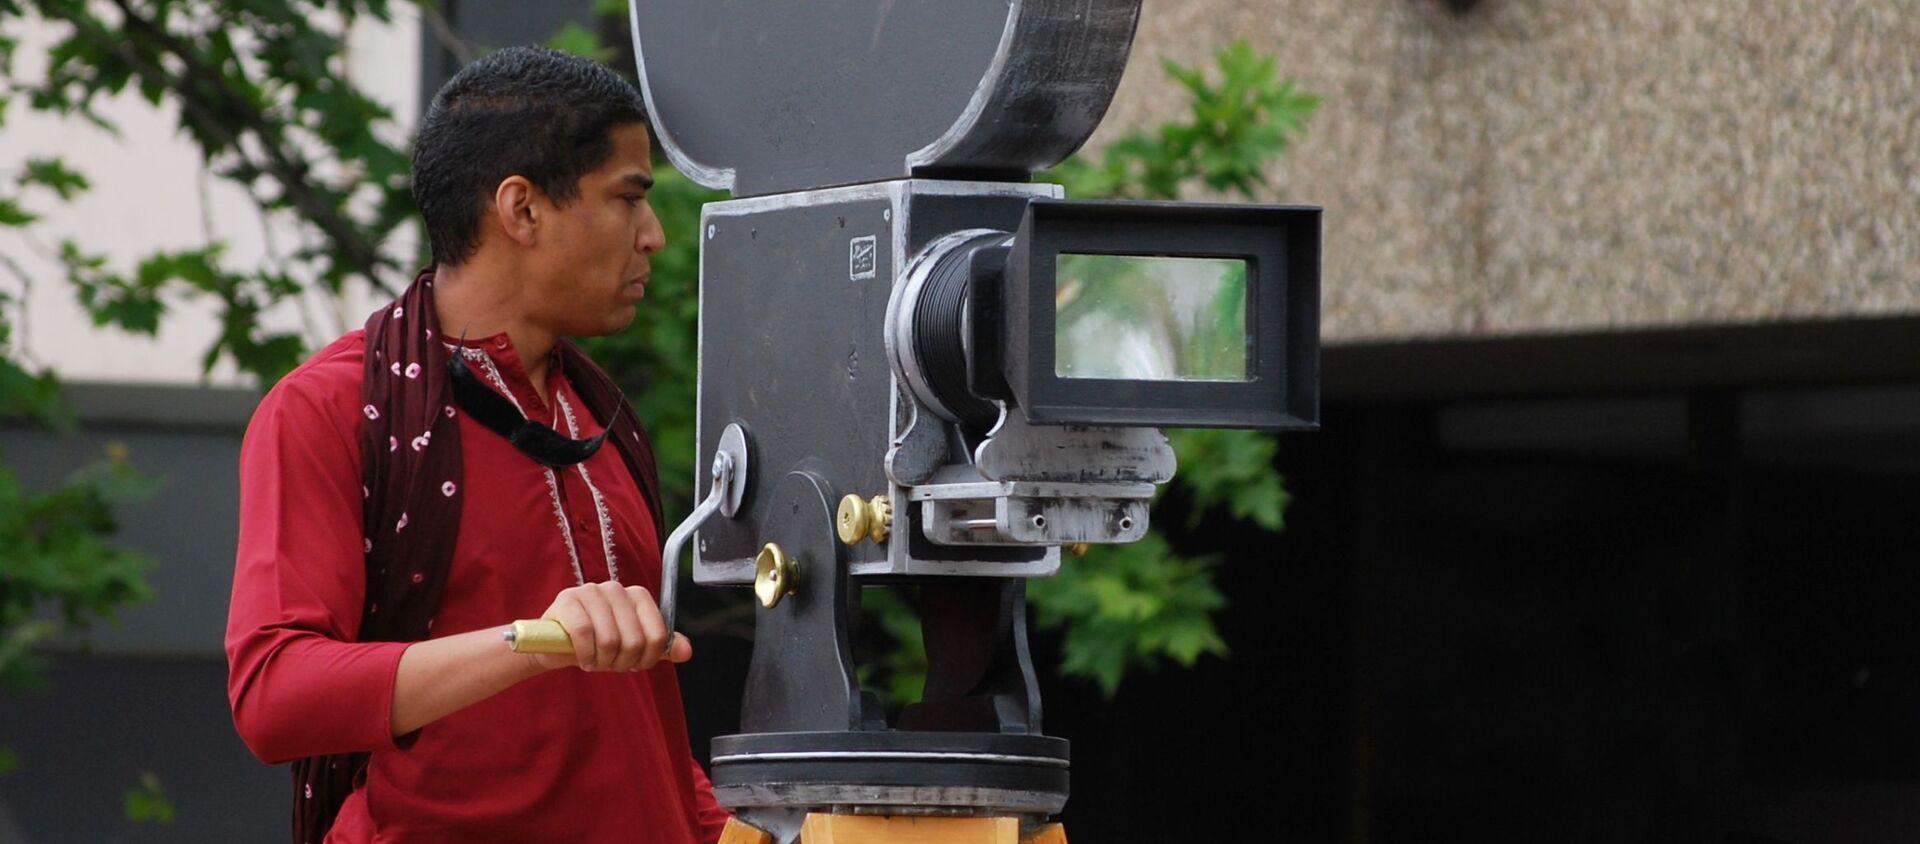 Bollywood cameraman  - Sputnik International, 1920